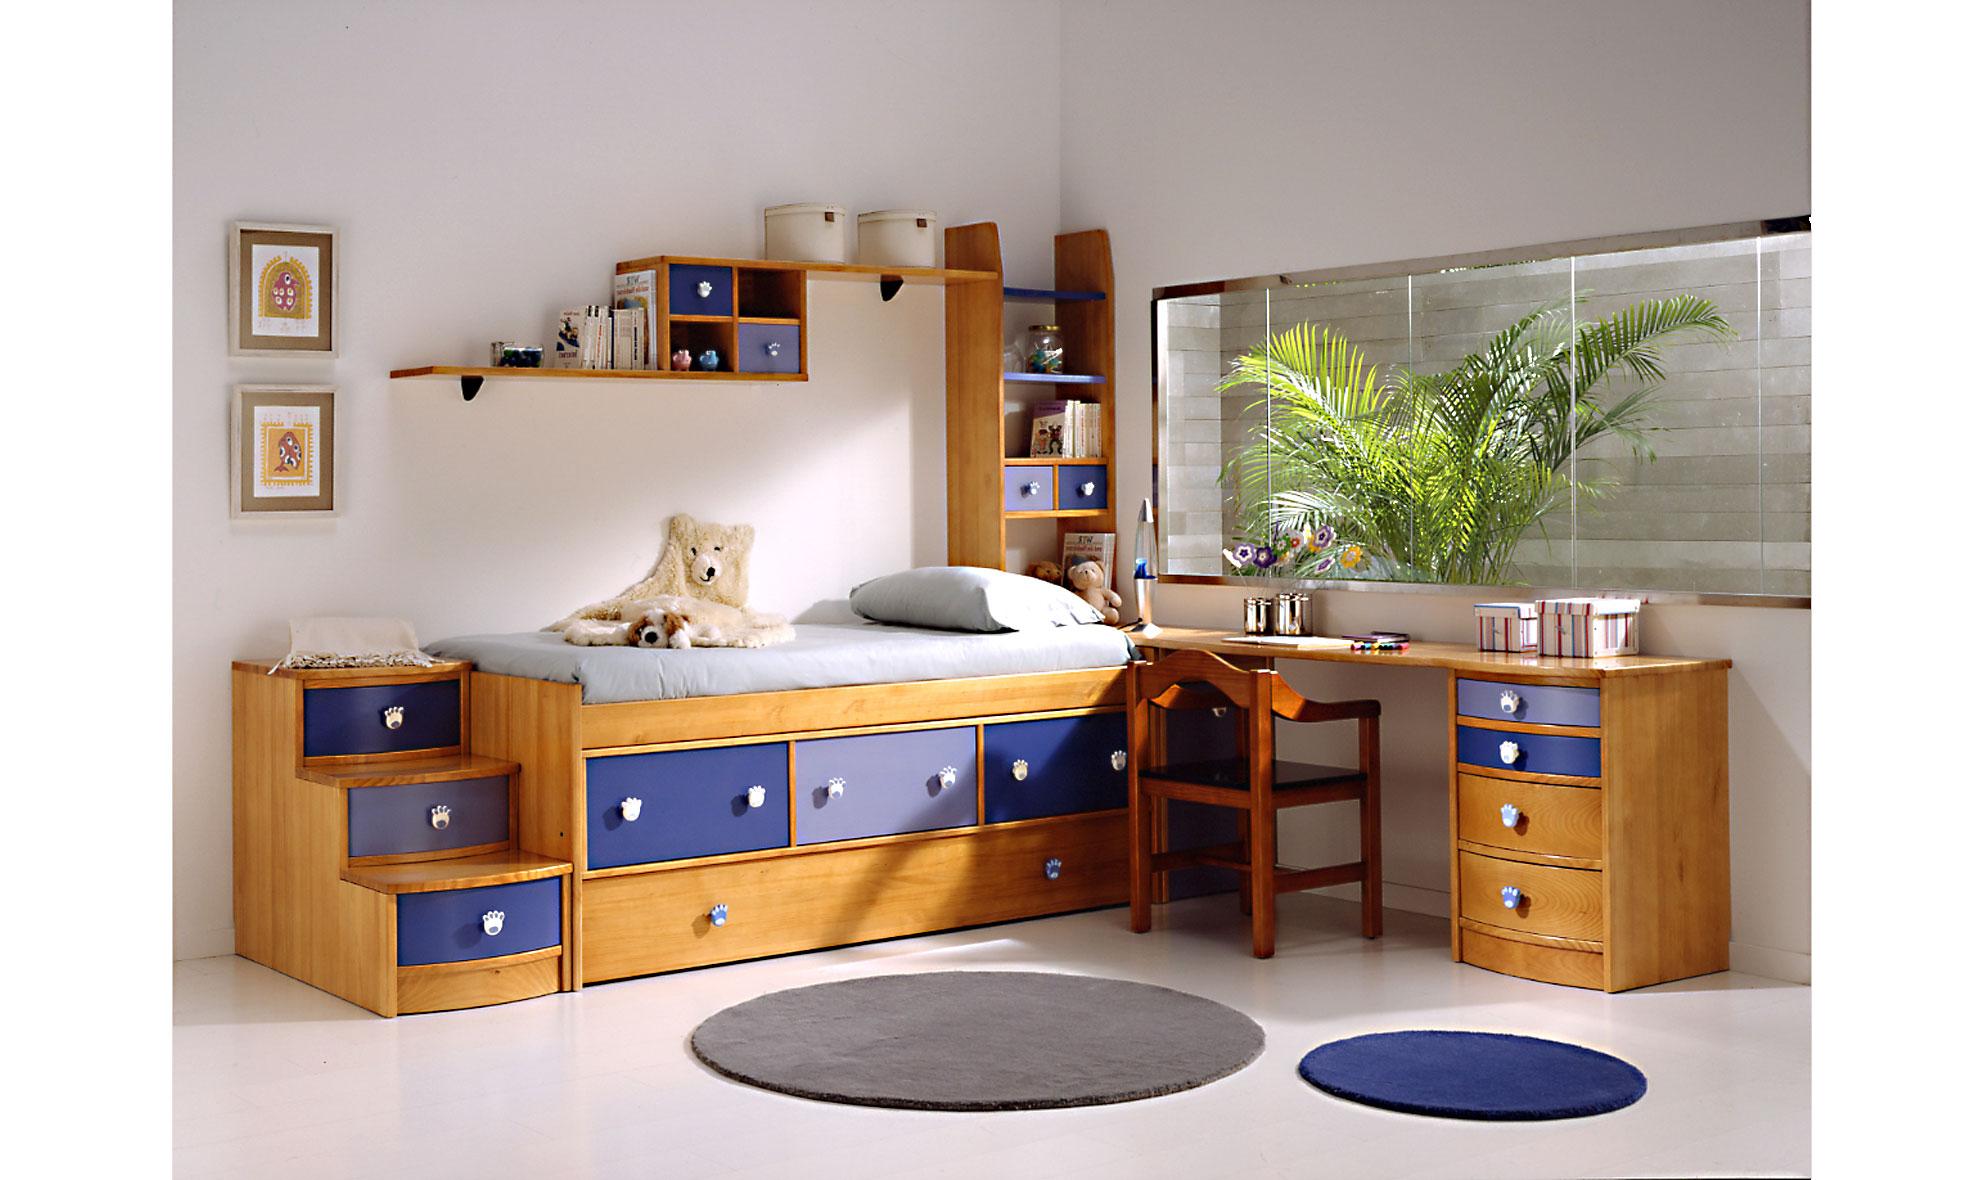 Muebles Habitacion Etdg Habitacià N Juvenil Alaska En Portobellostreet